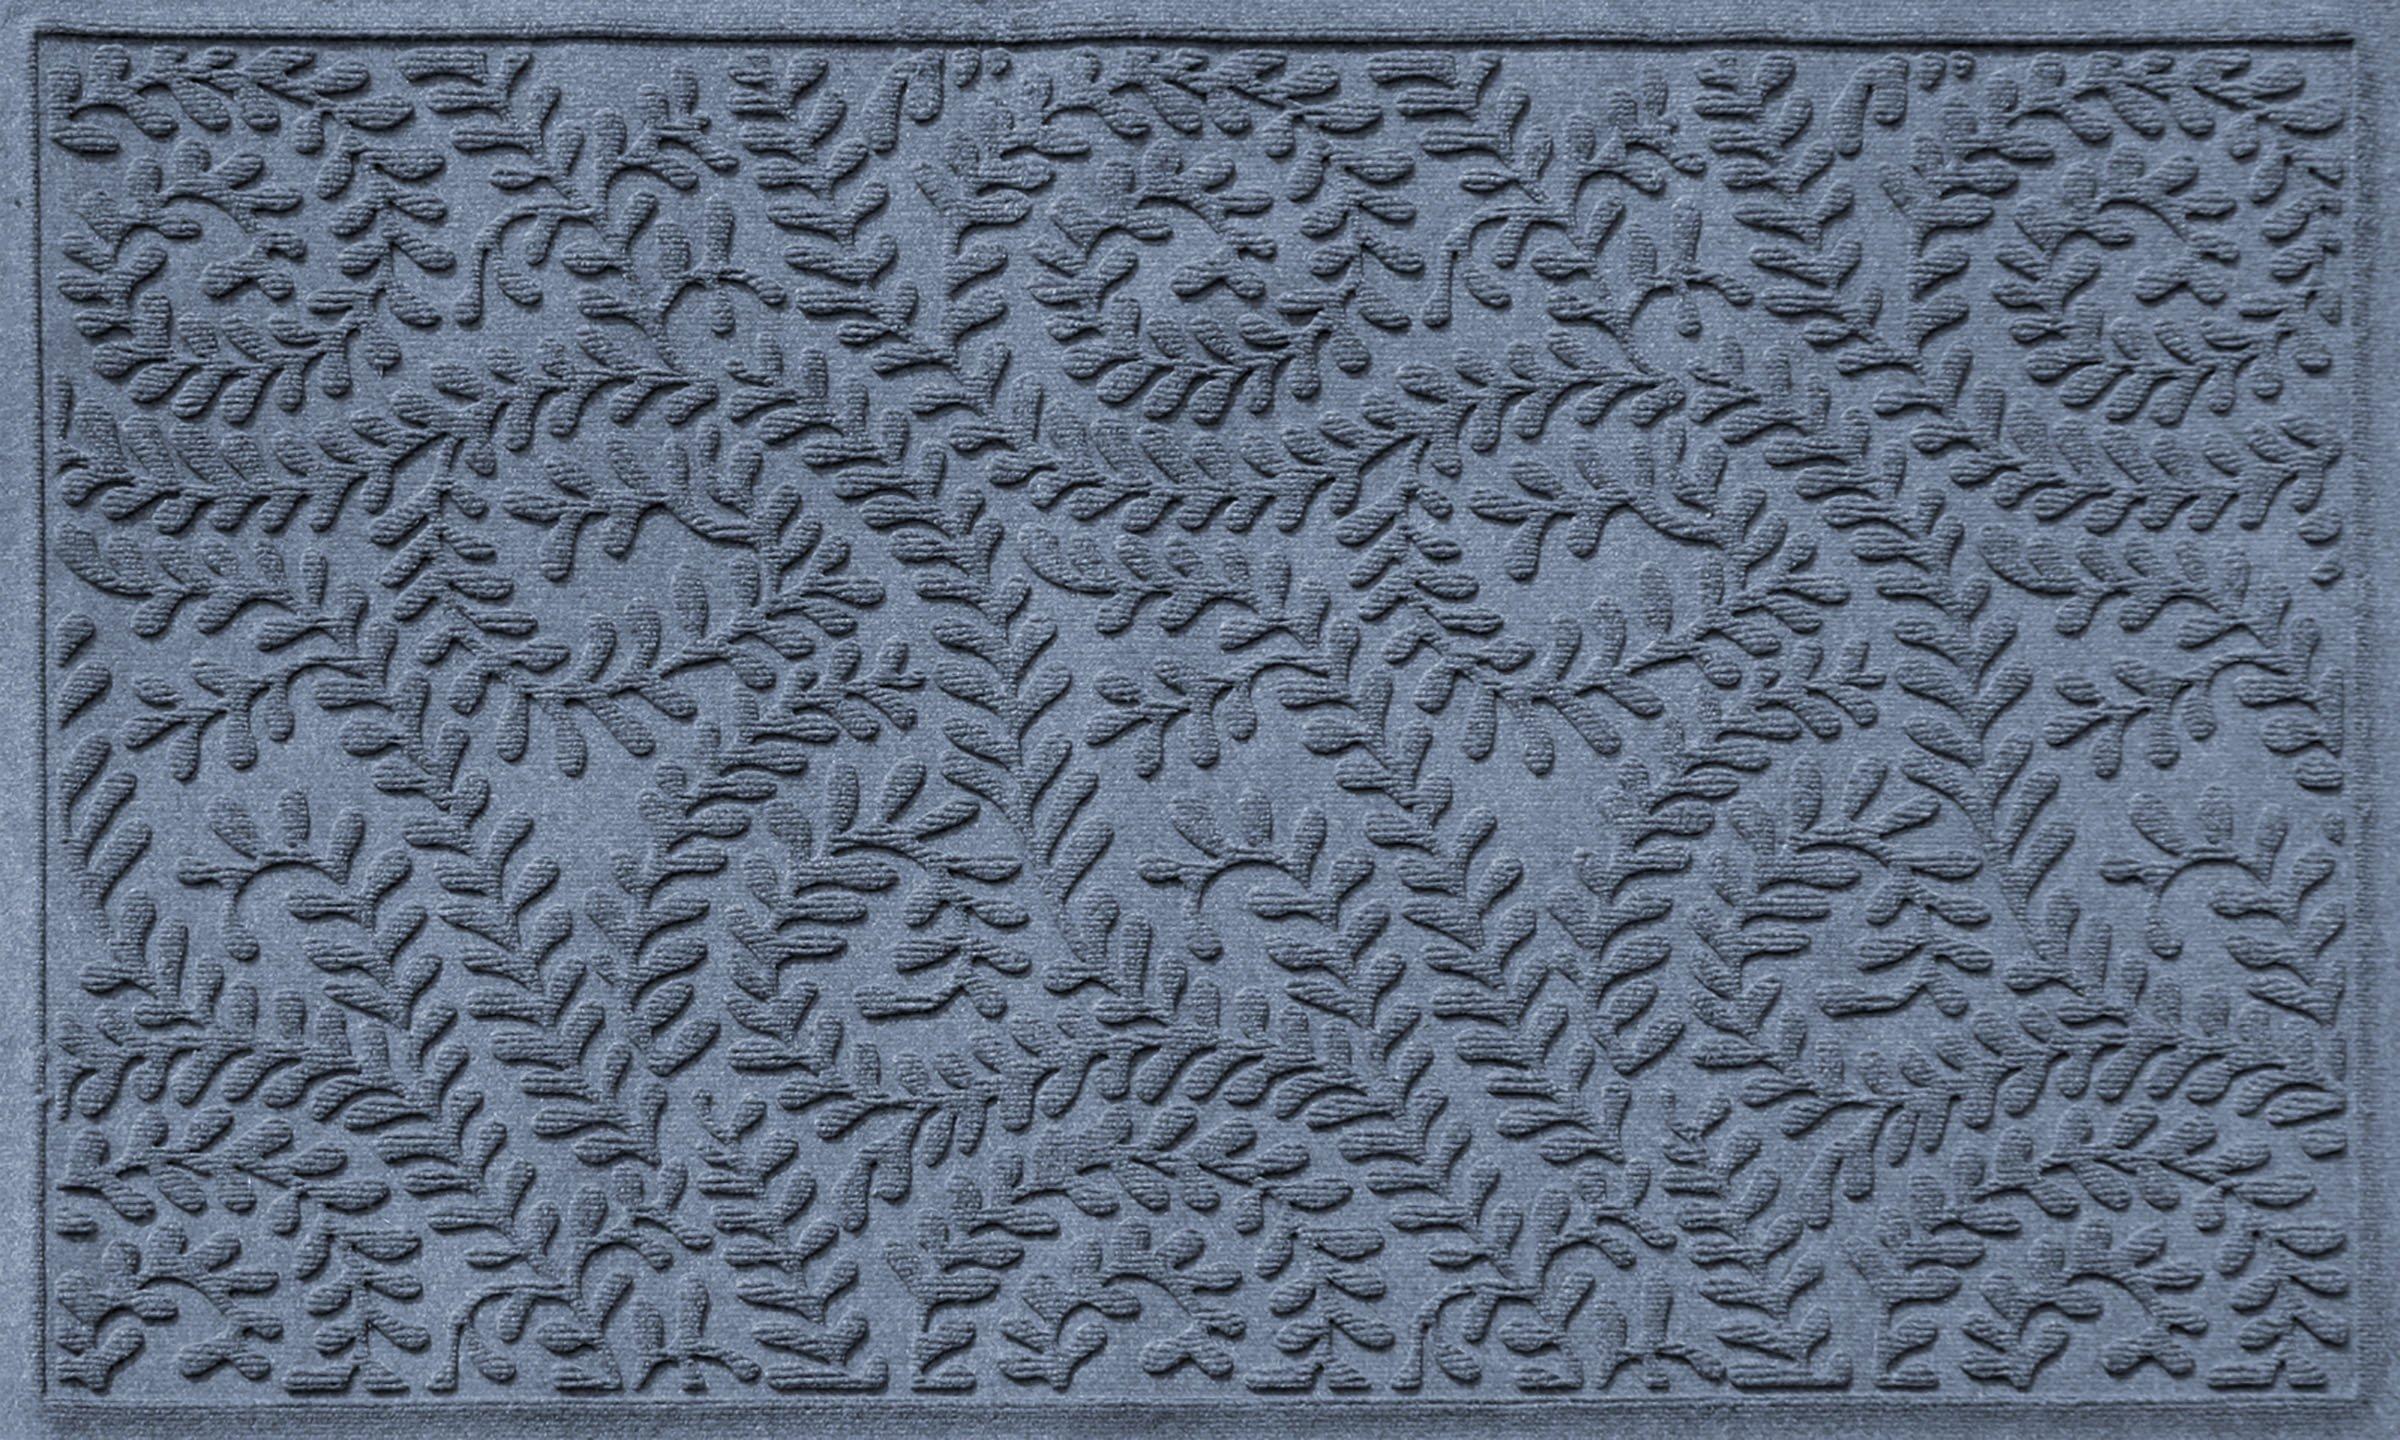 Bungalow Flooring Waterhog Indoor/Outdoor Doormat, 3' x 5', Skid Resistant, Easy to Clean, Catches Water and Debris, Boxwood Collection, Bluestone by Bungalow Flooring (Image #1)